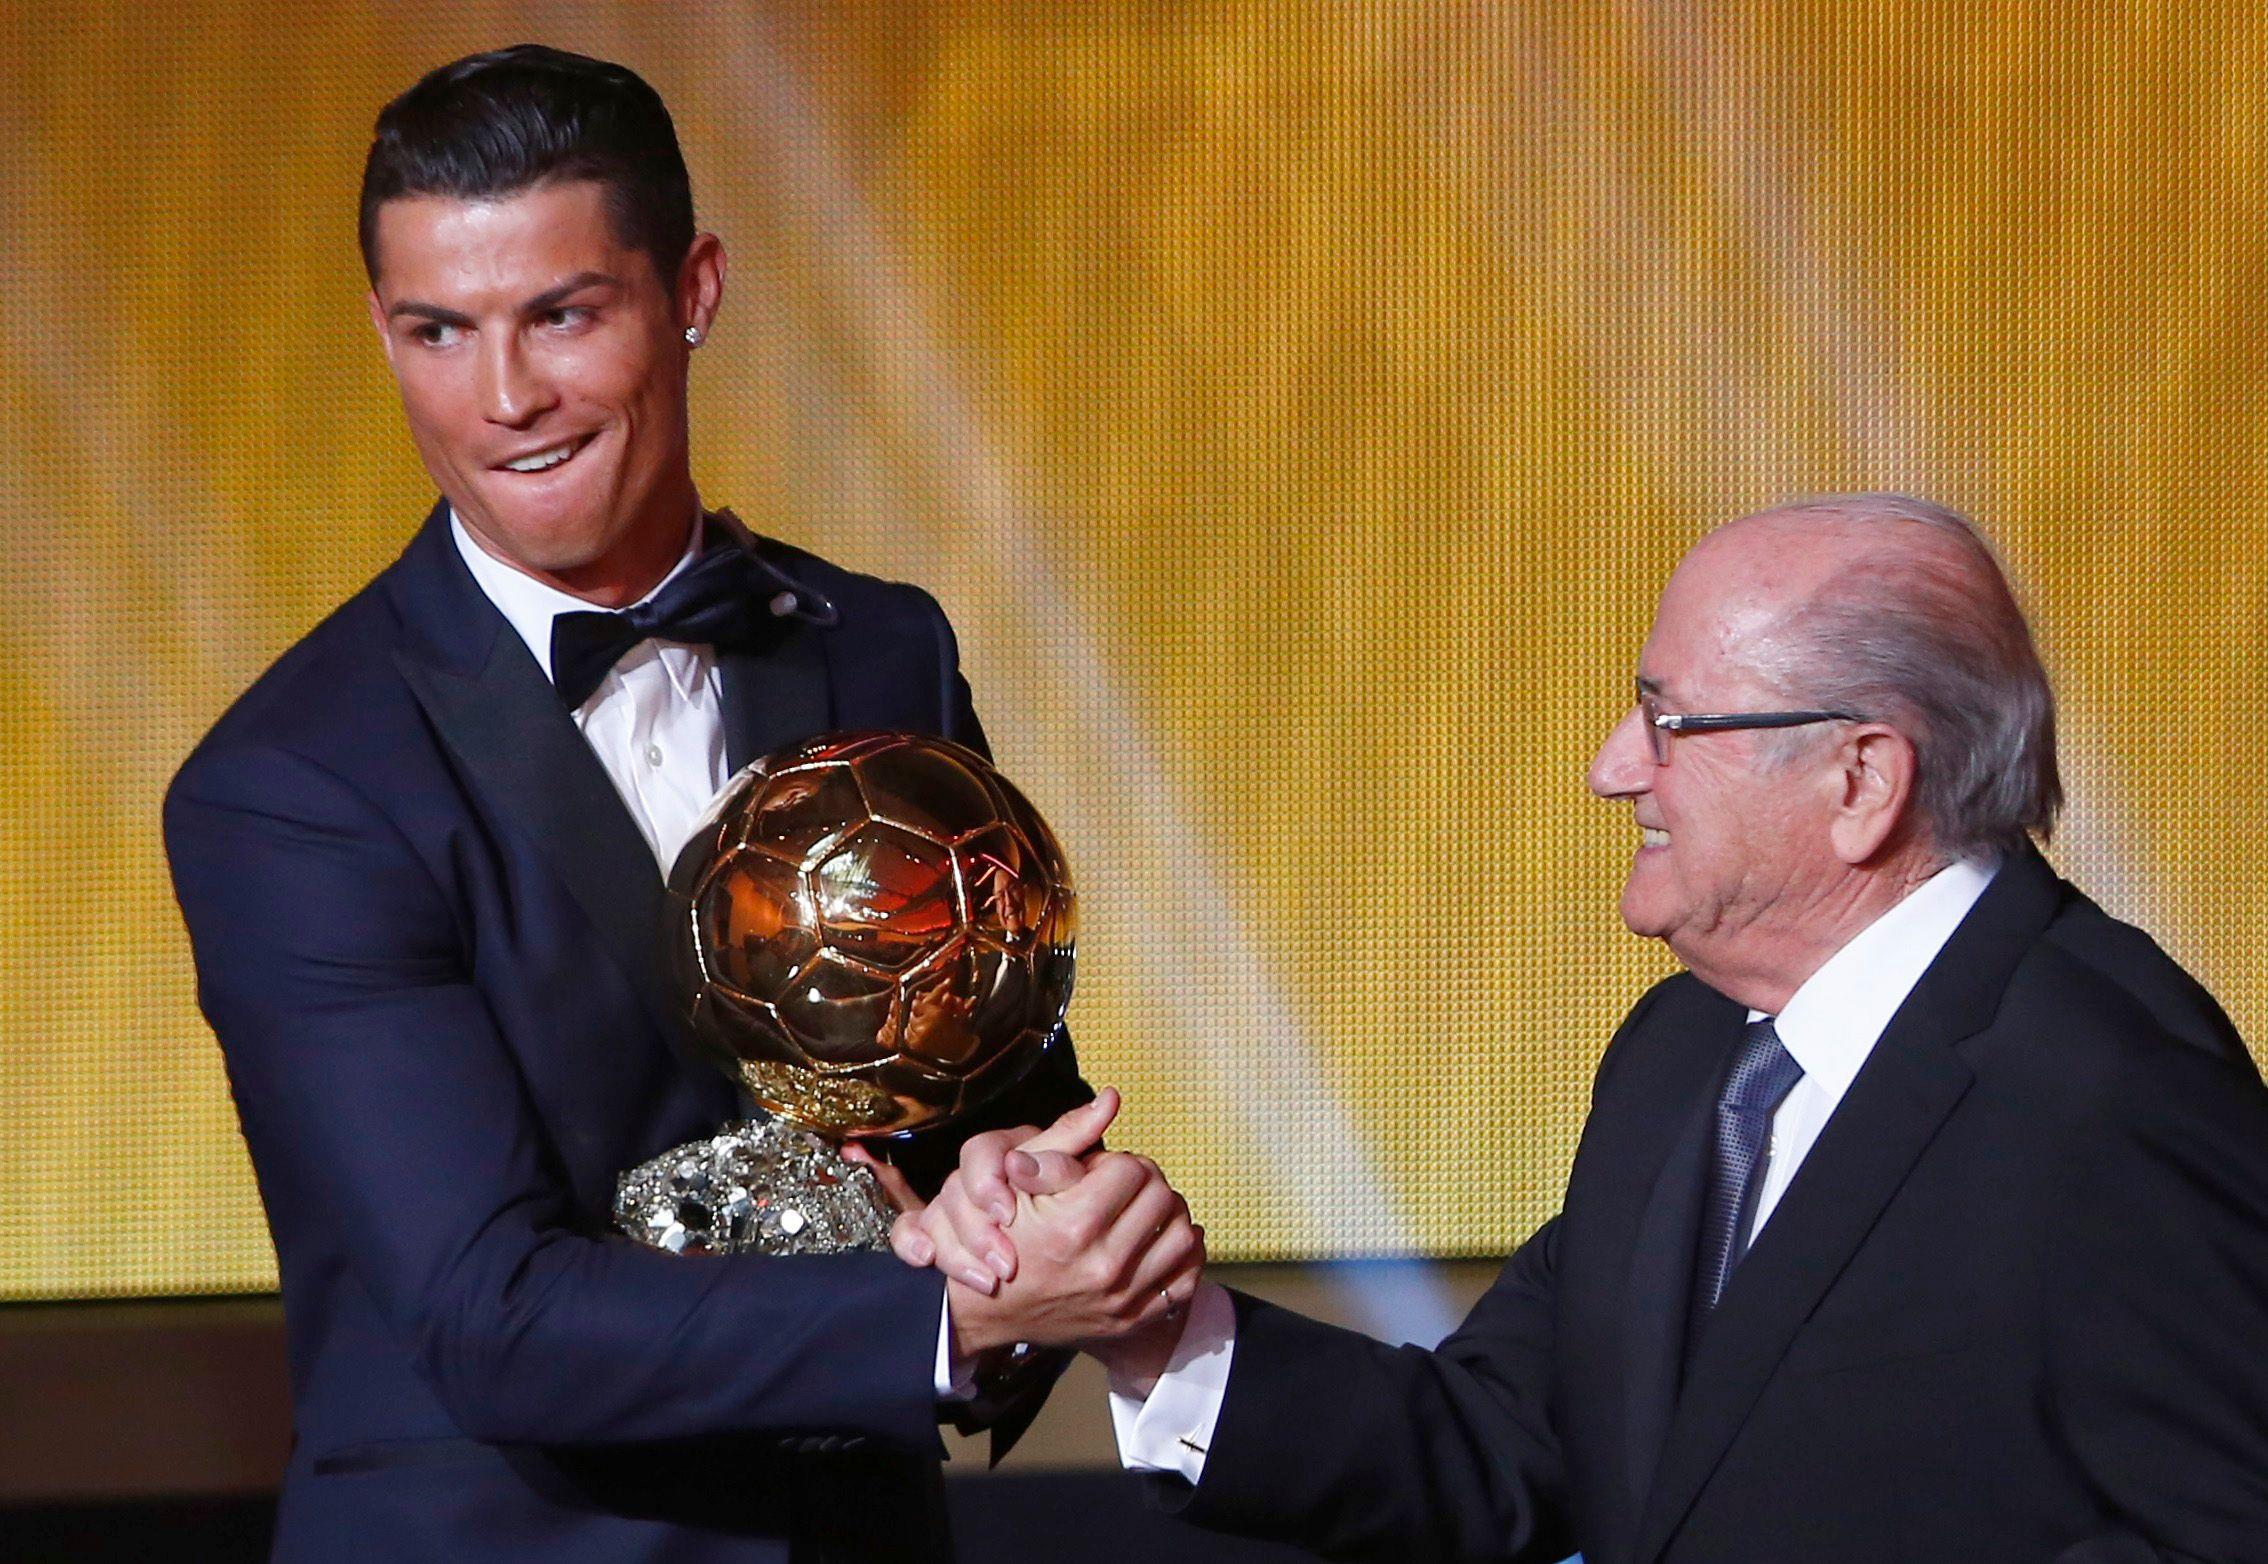 Cristiano Ronaldo bientôt au cinéma dans un film de Martin Scorsese